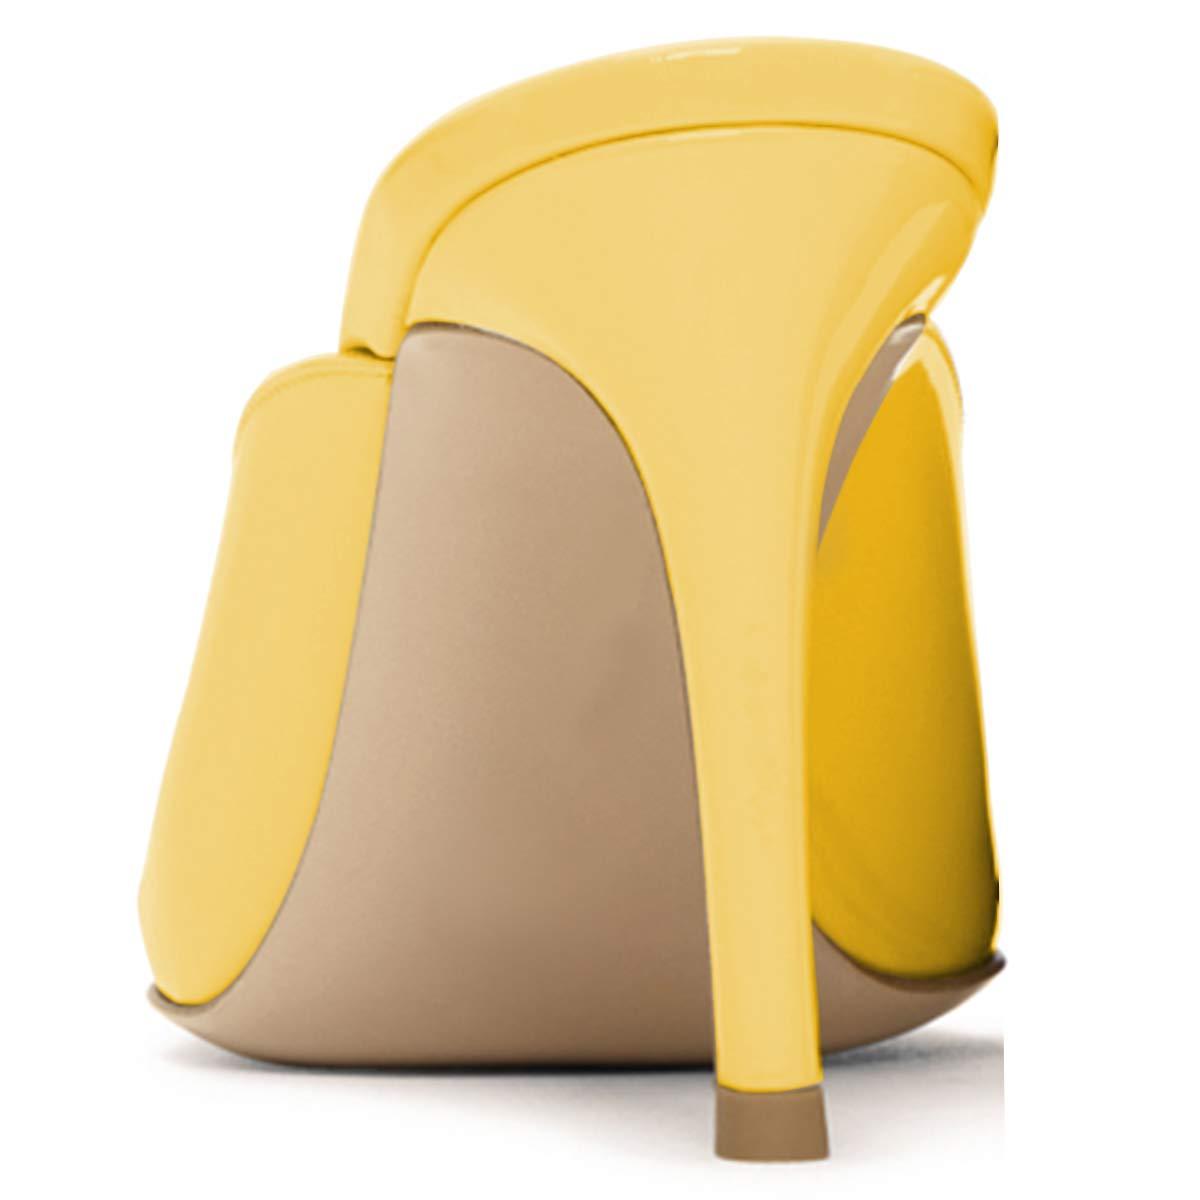 XYD Women High Heels Mules Pointed Toe Slip On Slide Sandals Patent Dress Slipper Shoes